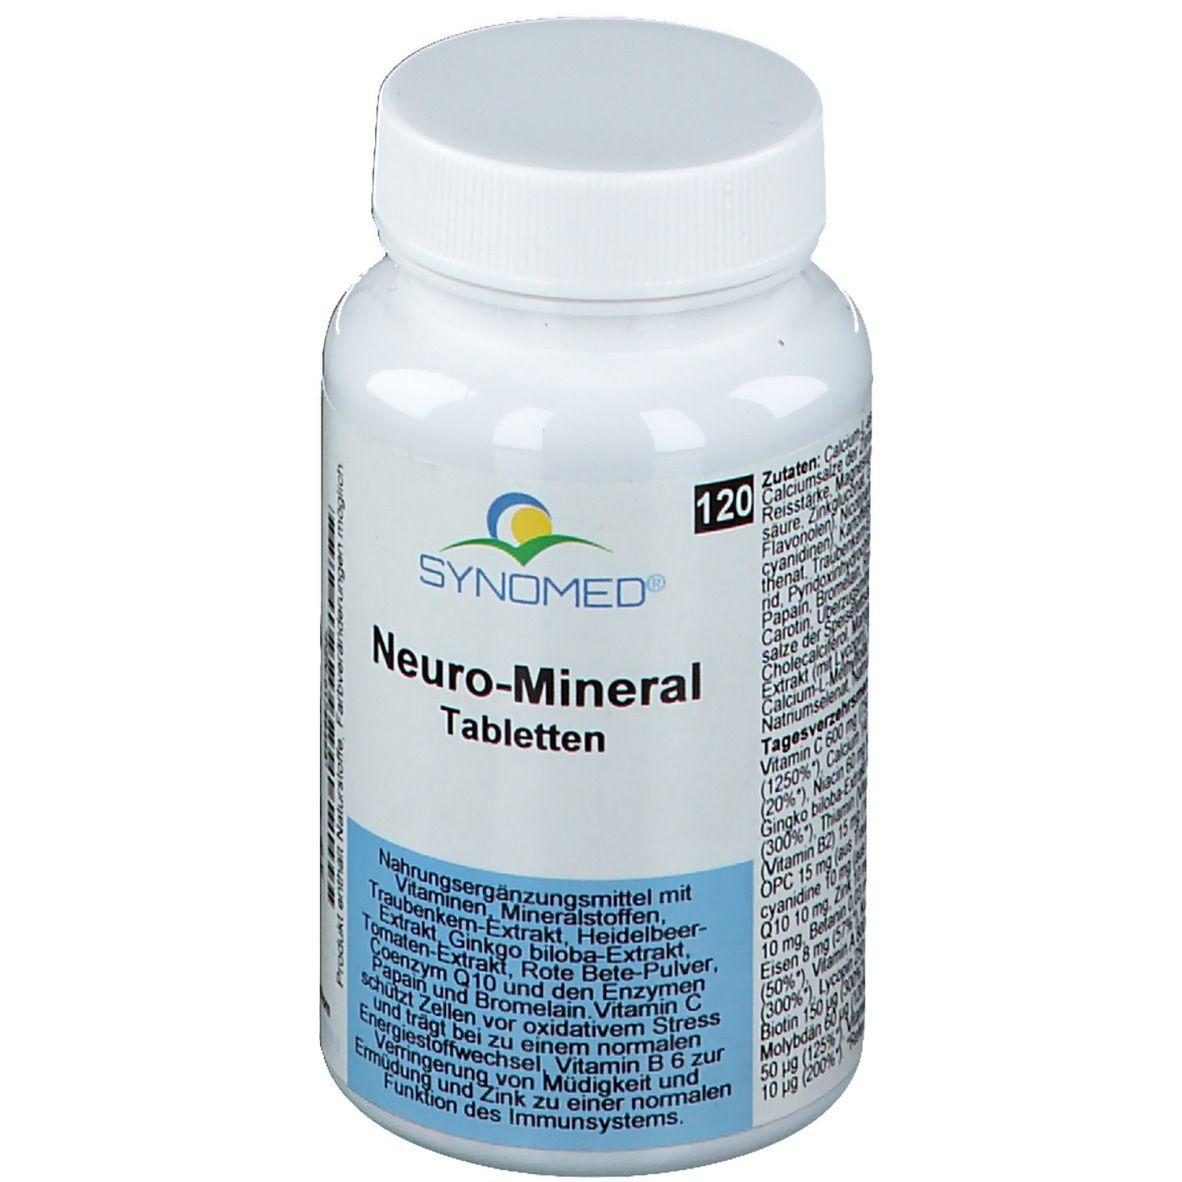 SYNOMED Neuro-Mineral